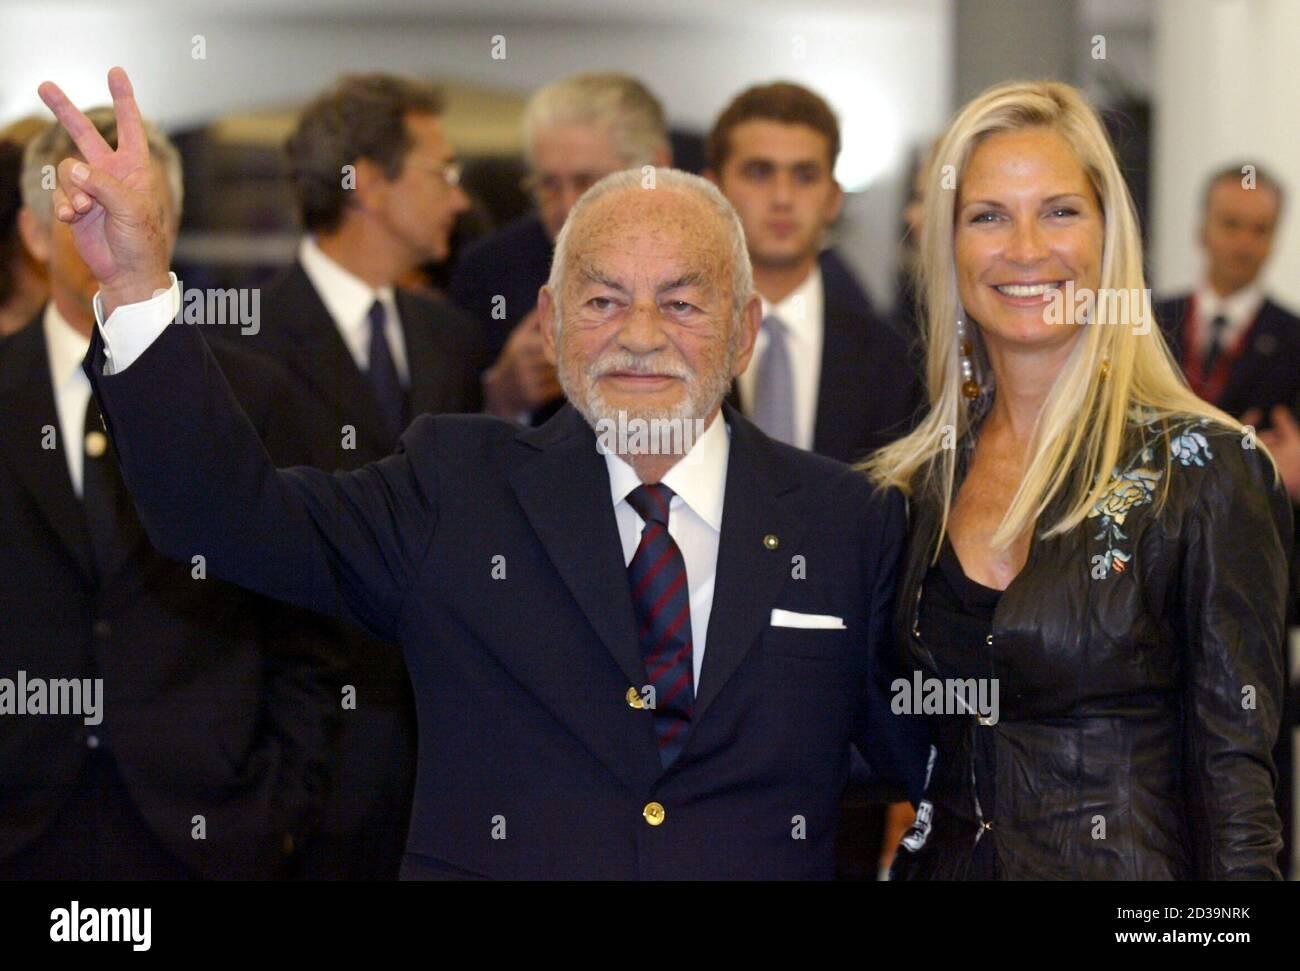 Italian producer Dino De Laurentiis and his wife Martha arrive at the Venice Film Festival September 1, 2003. De Laurentiis received the Golden Lion lifetime achievment award . Stock Photo